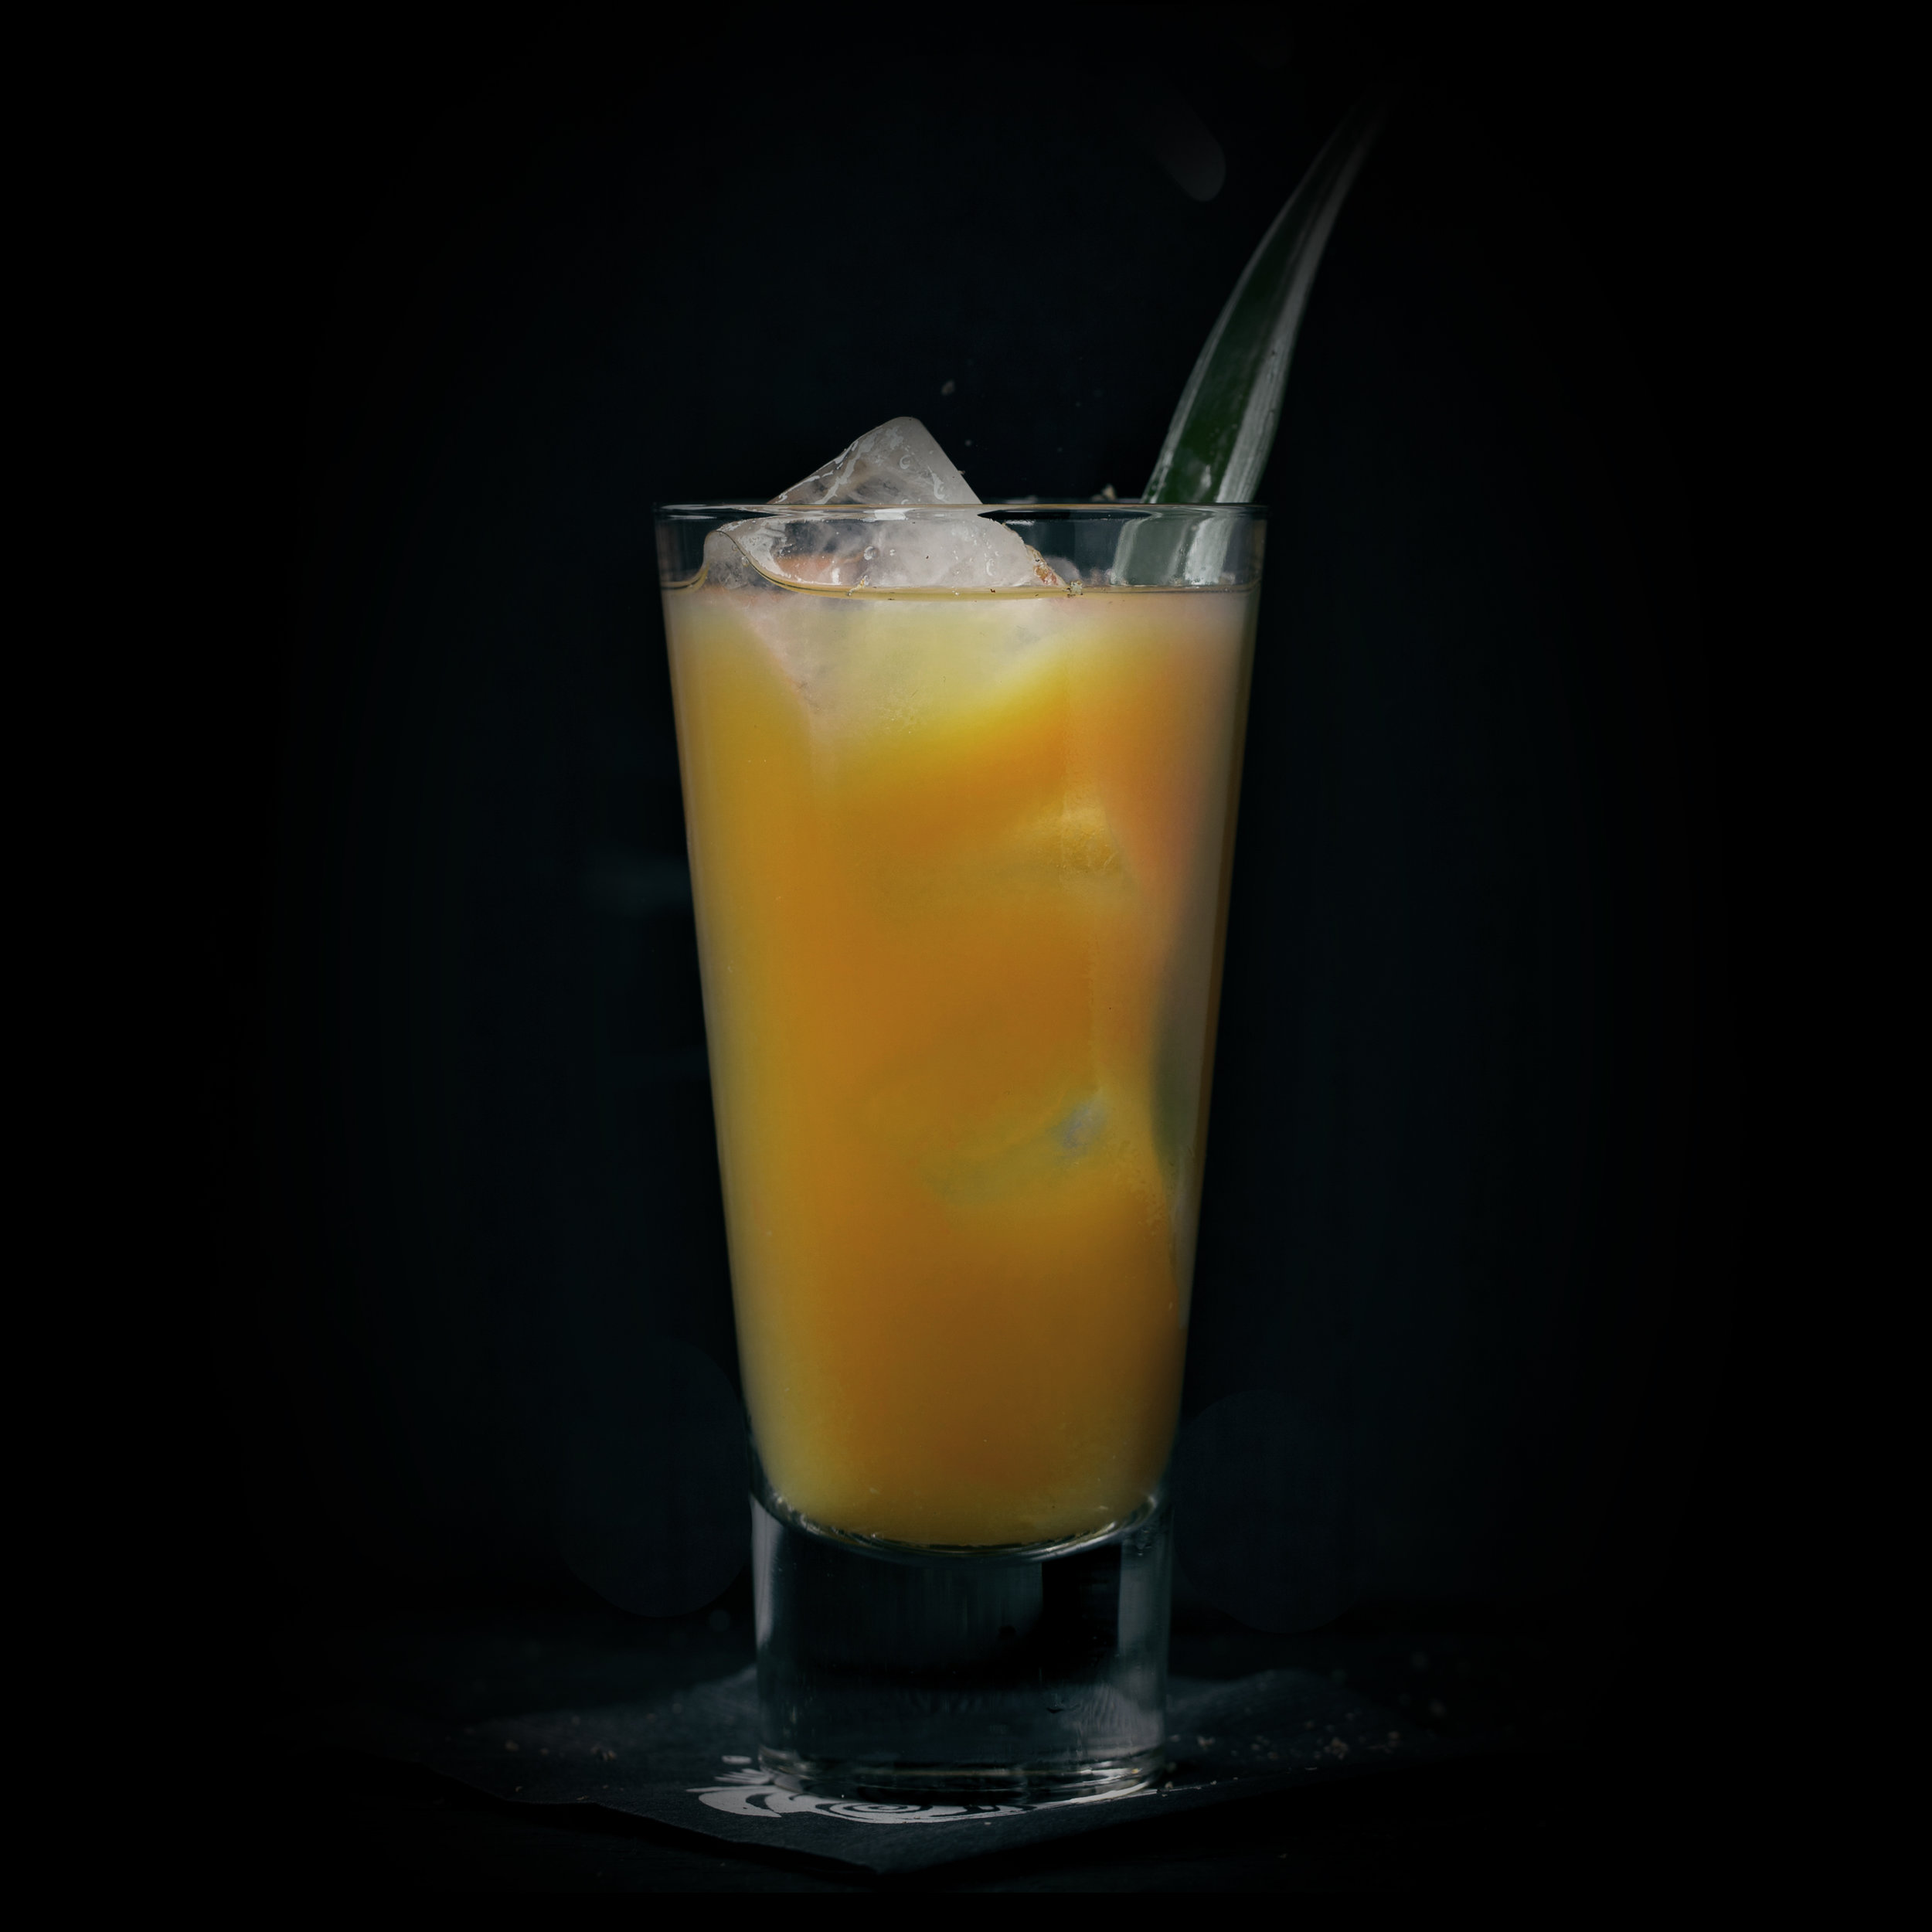 COPA DEL SILENCIO  INGREDIENTS  - 2 oz. El Silencio Espadin - .5 oz. Agave Nectar - .5 oz. Fresh Lime Juice - 2 oz. Fresh Pineapple Juice  METHOD  Shake & Strain Grated Nutmeg & Pineapple Leaf- Collins Glass